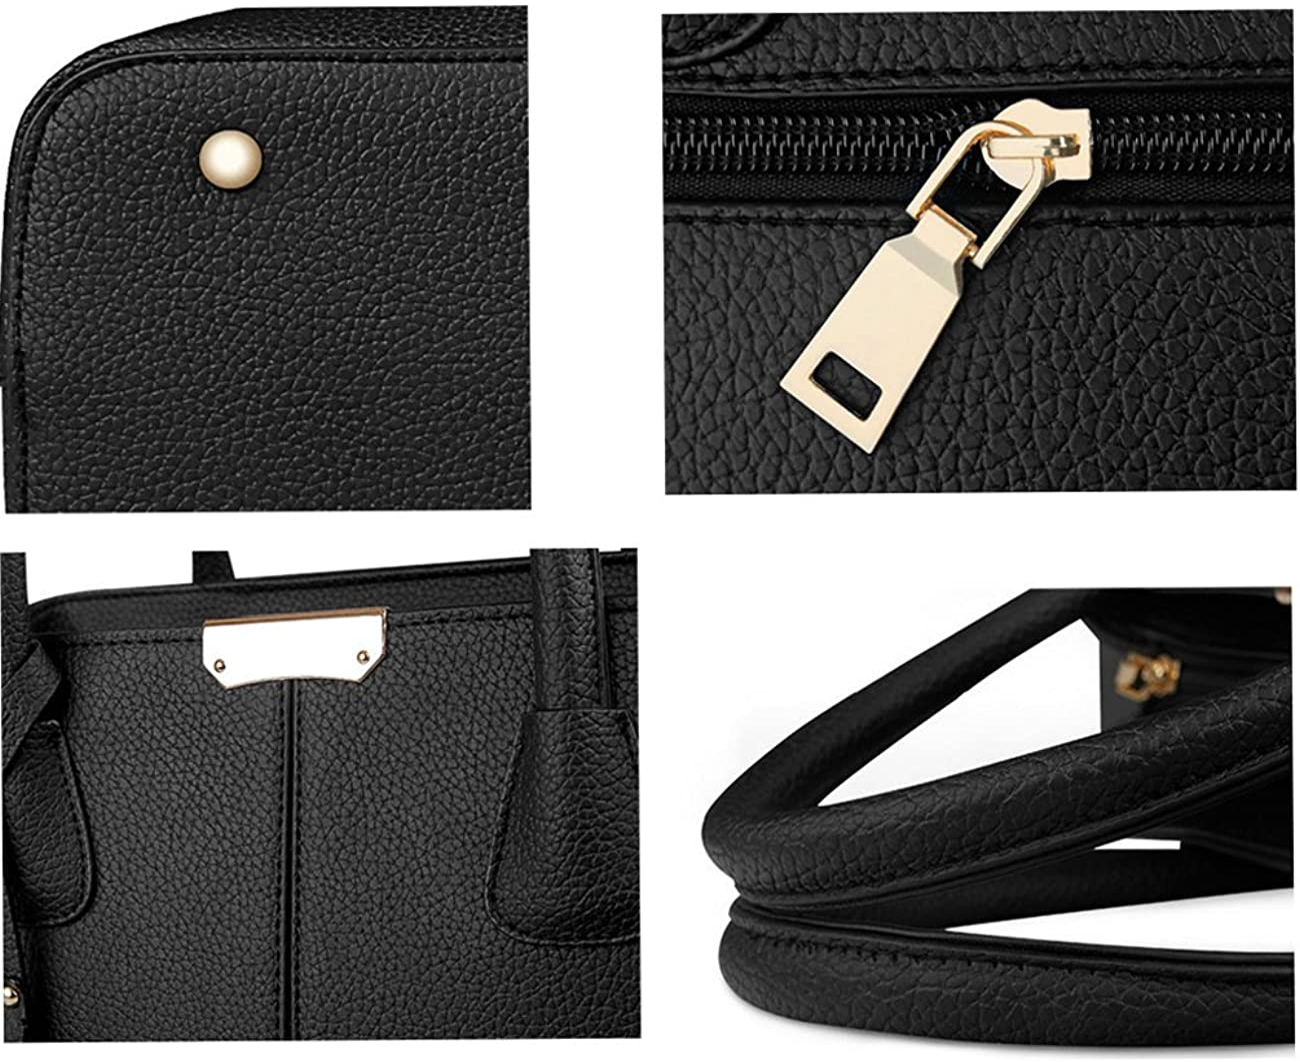 B/&E LIFE Stylish Women Pu Leather Vertical Utility Top Handle Handbag Satchel Tote Purse Bag